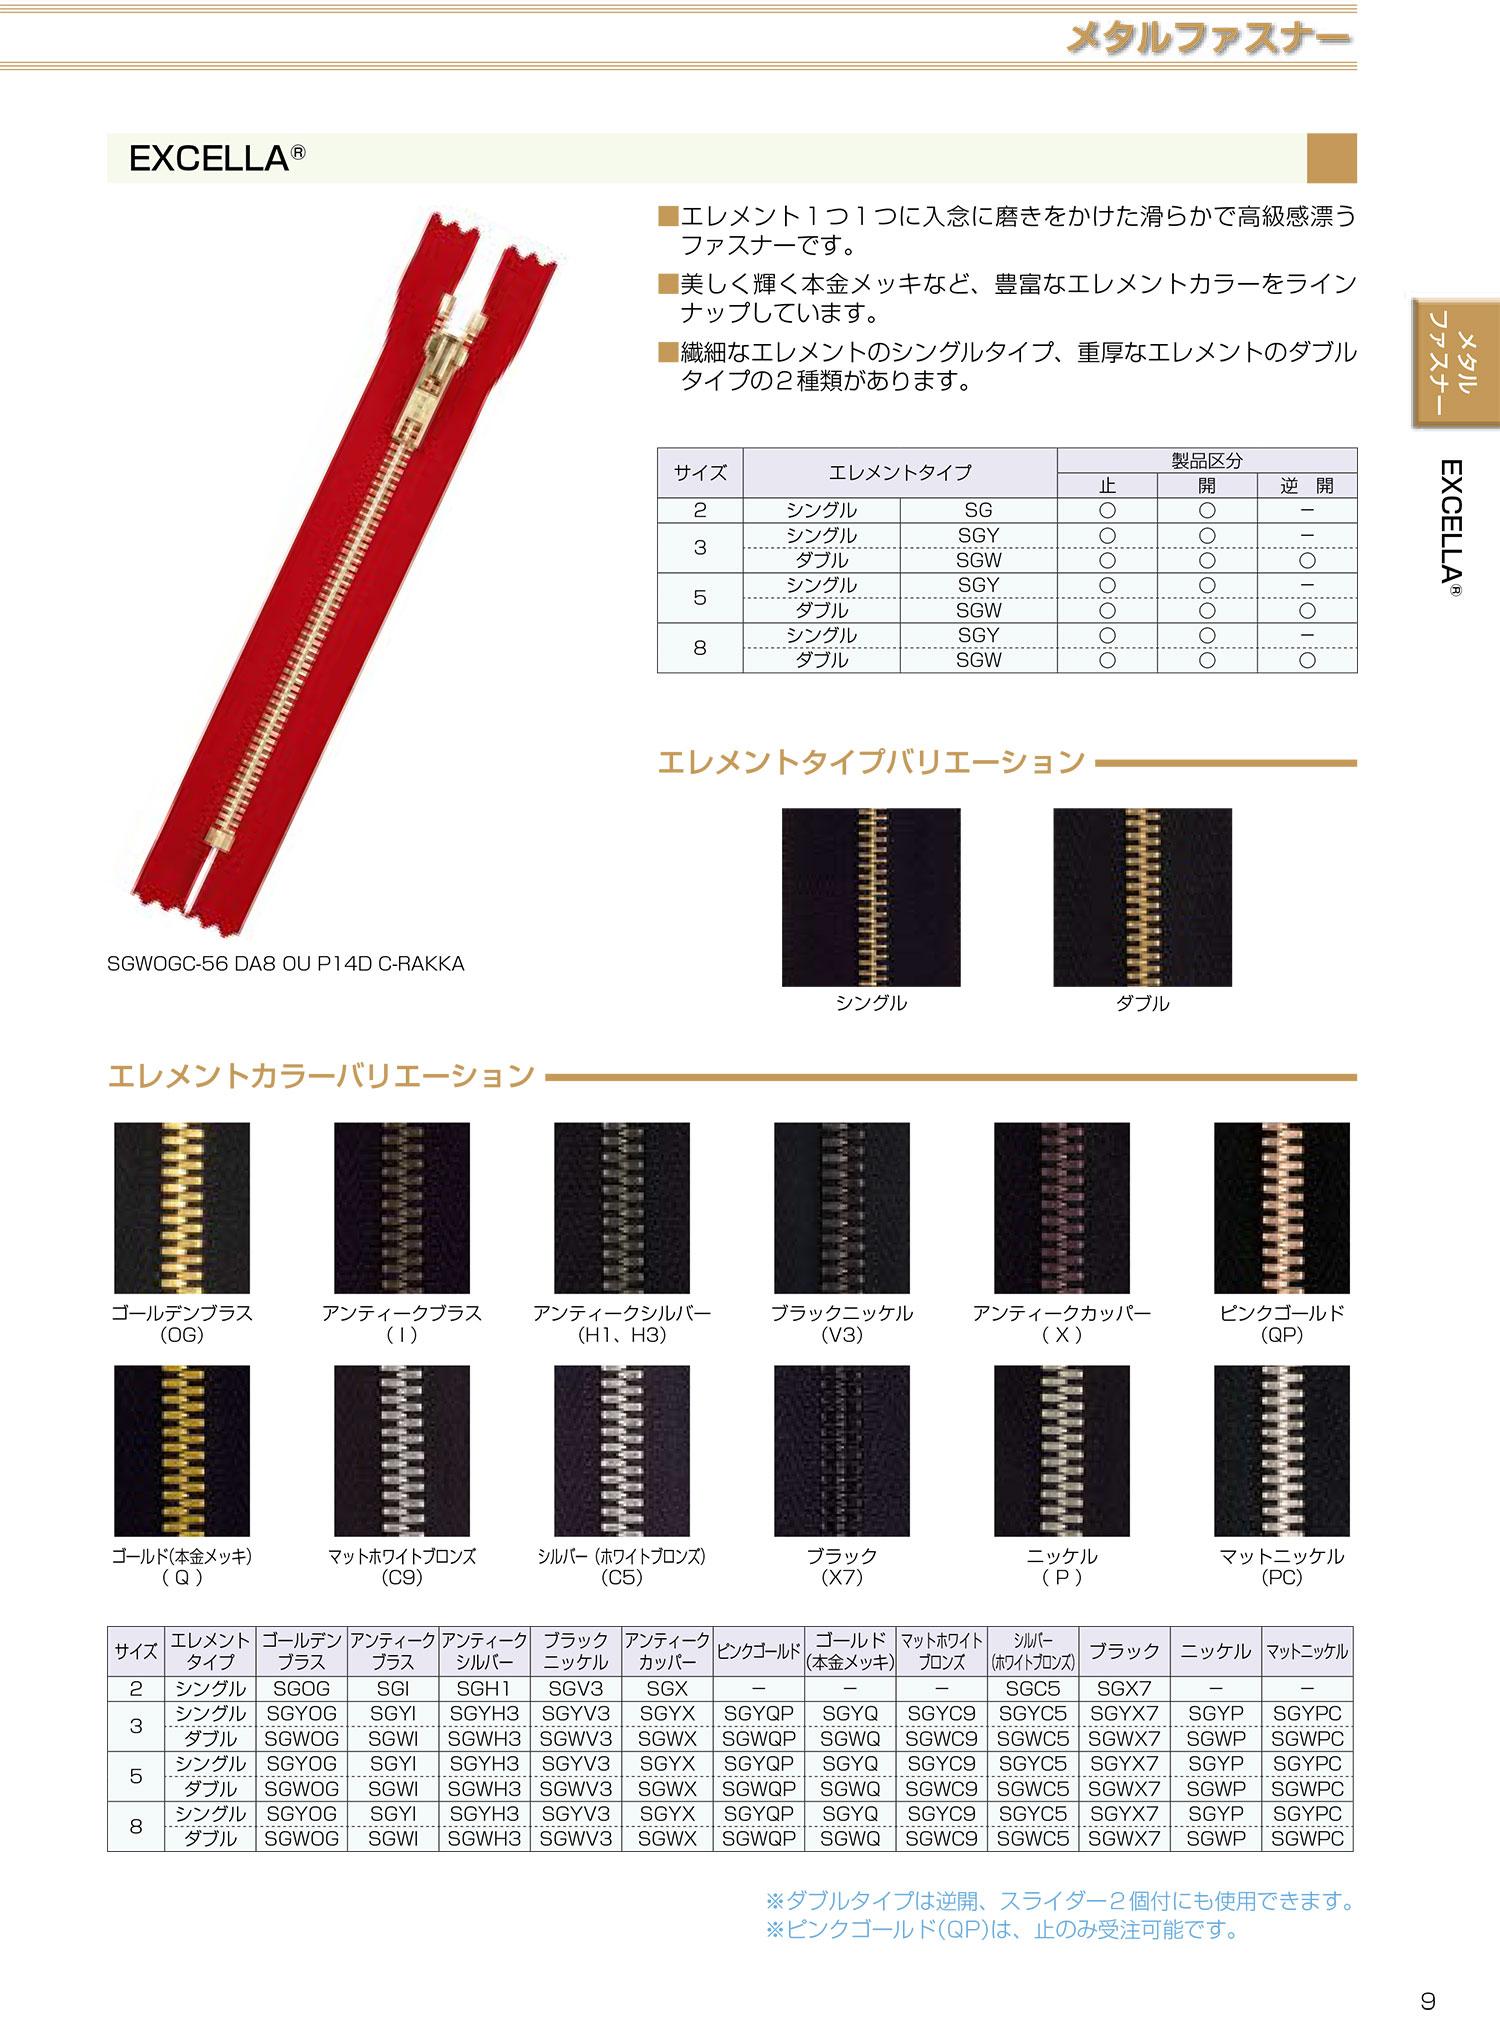 2SGC5OR エクセラ 2サイズ シルバー(ホワイトブロンズ) オープン シングル[ファスナー] YKK/オークラ商事 - ApparelX アパレル資材卸通販